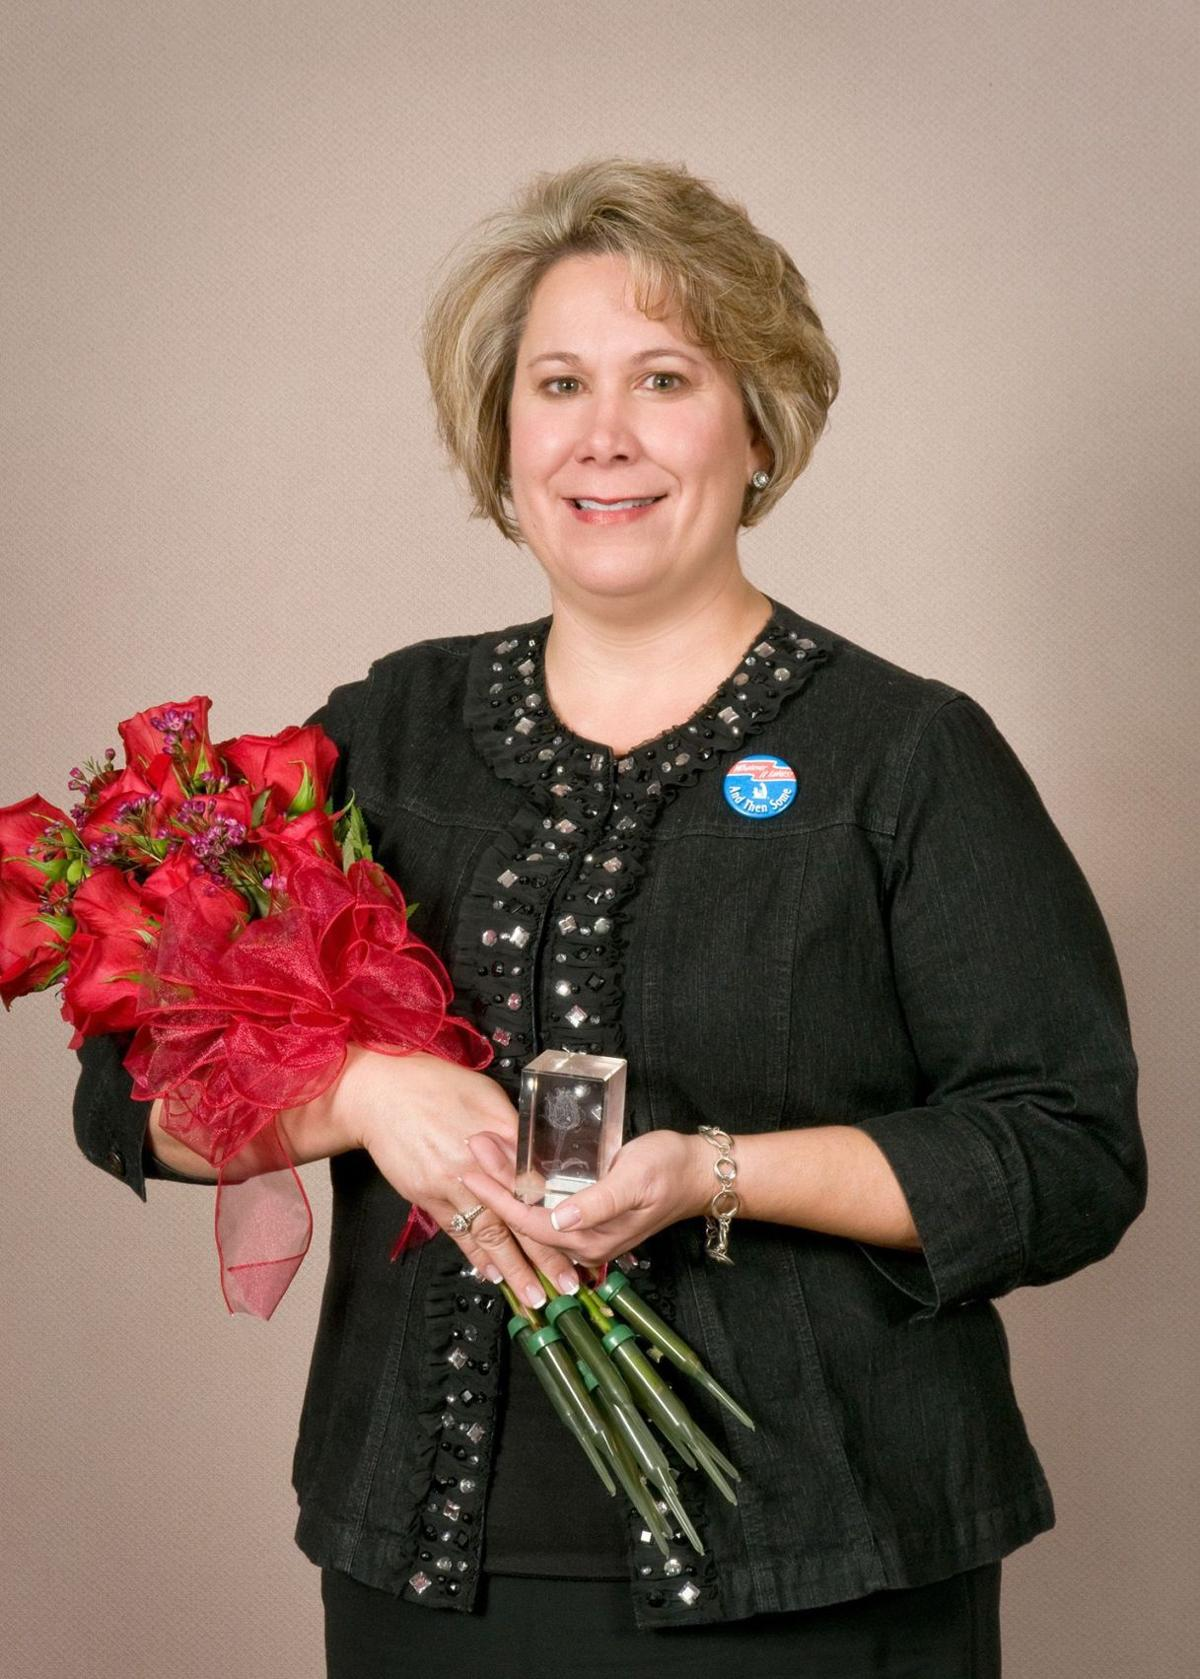 Local nursing director honored